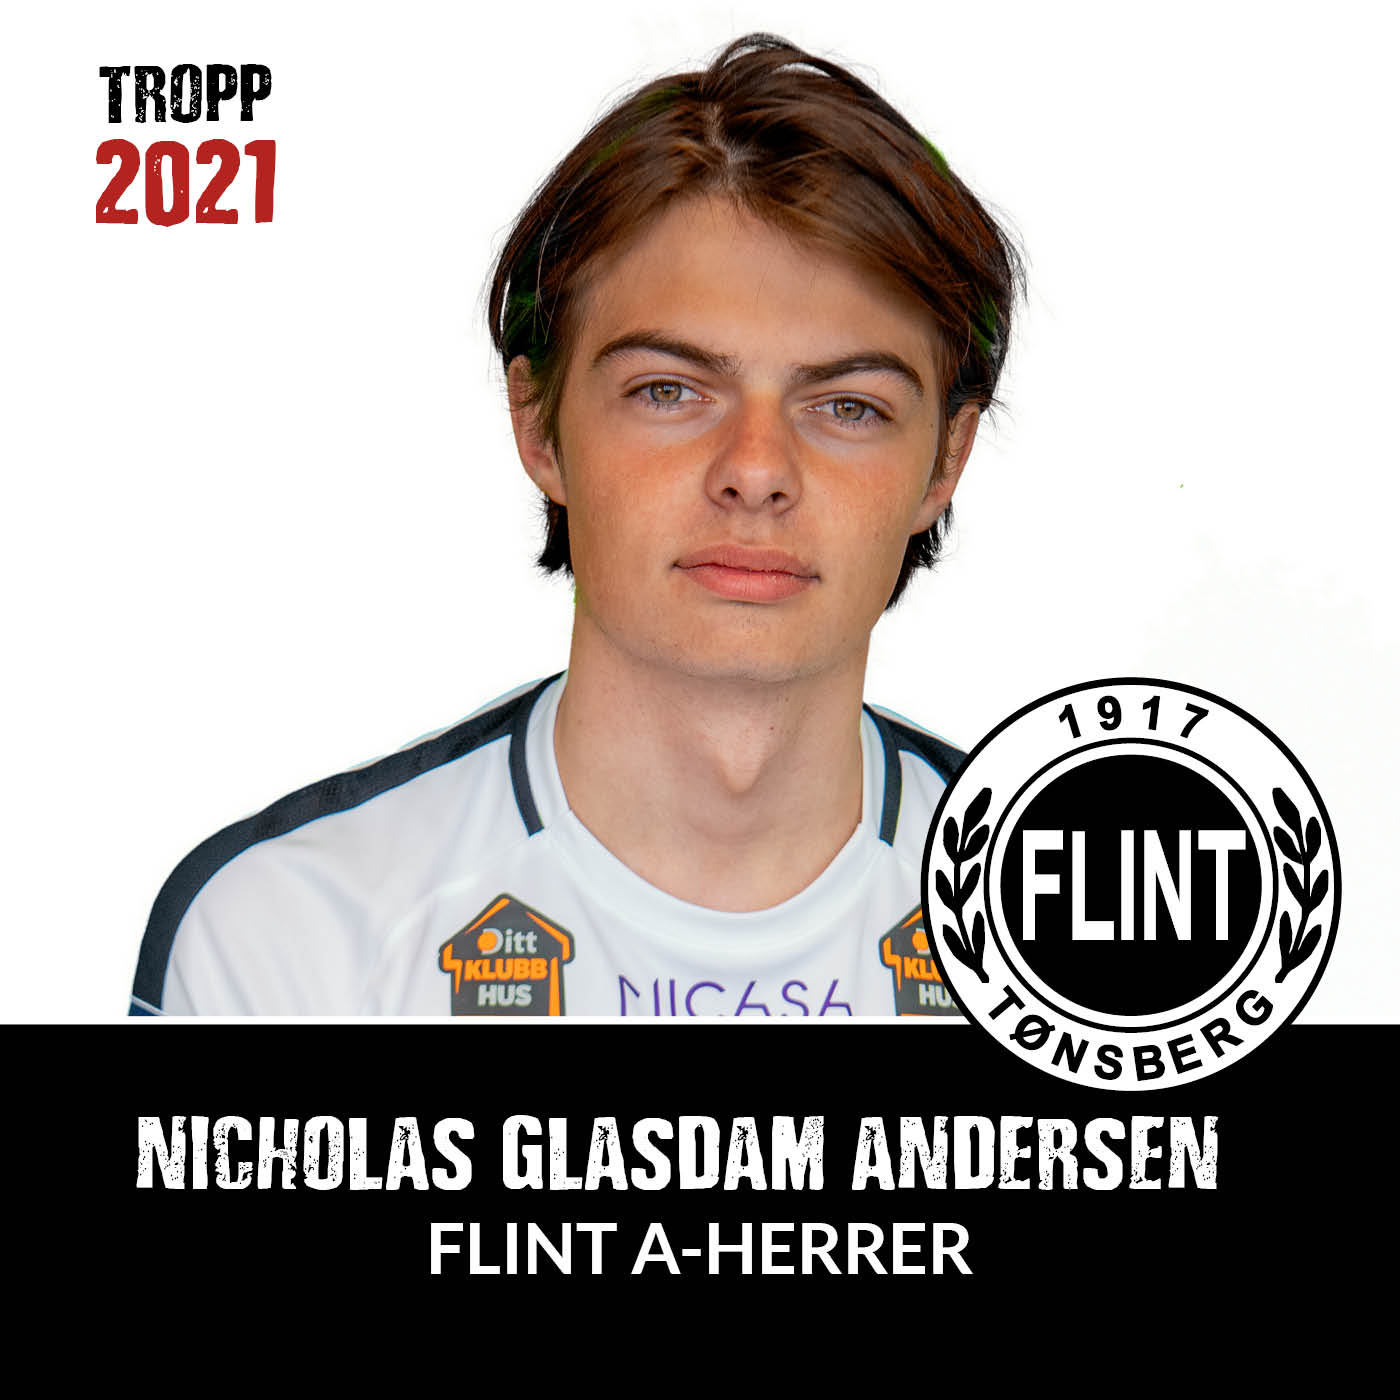 https://www.flintfotball.no/wp-content/uploads/2021/01/A-lag-herre-2021-Nicholas-Glasdam-Andersen.jpg